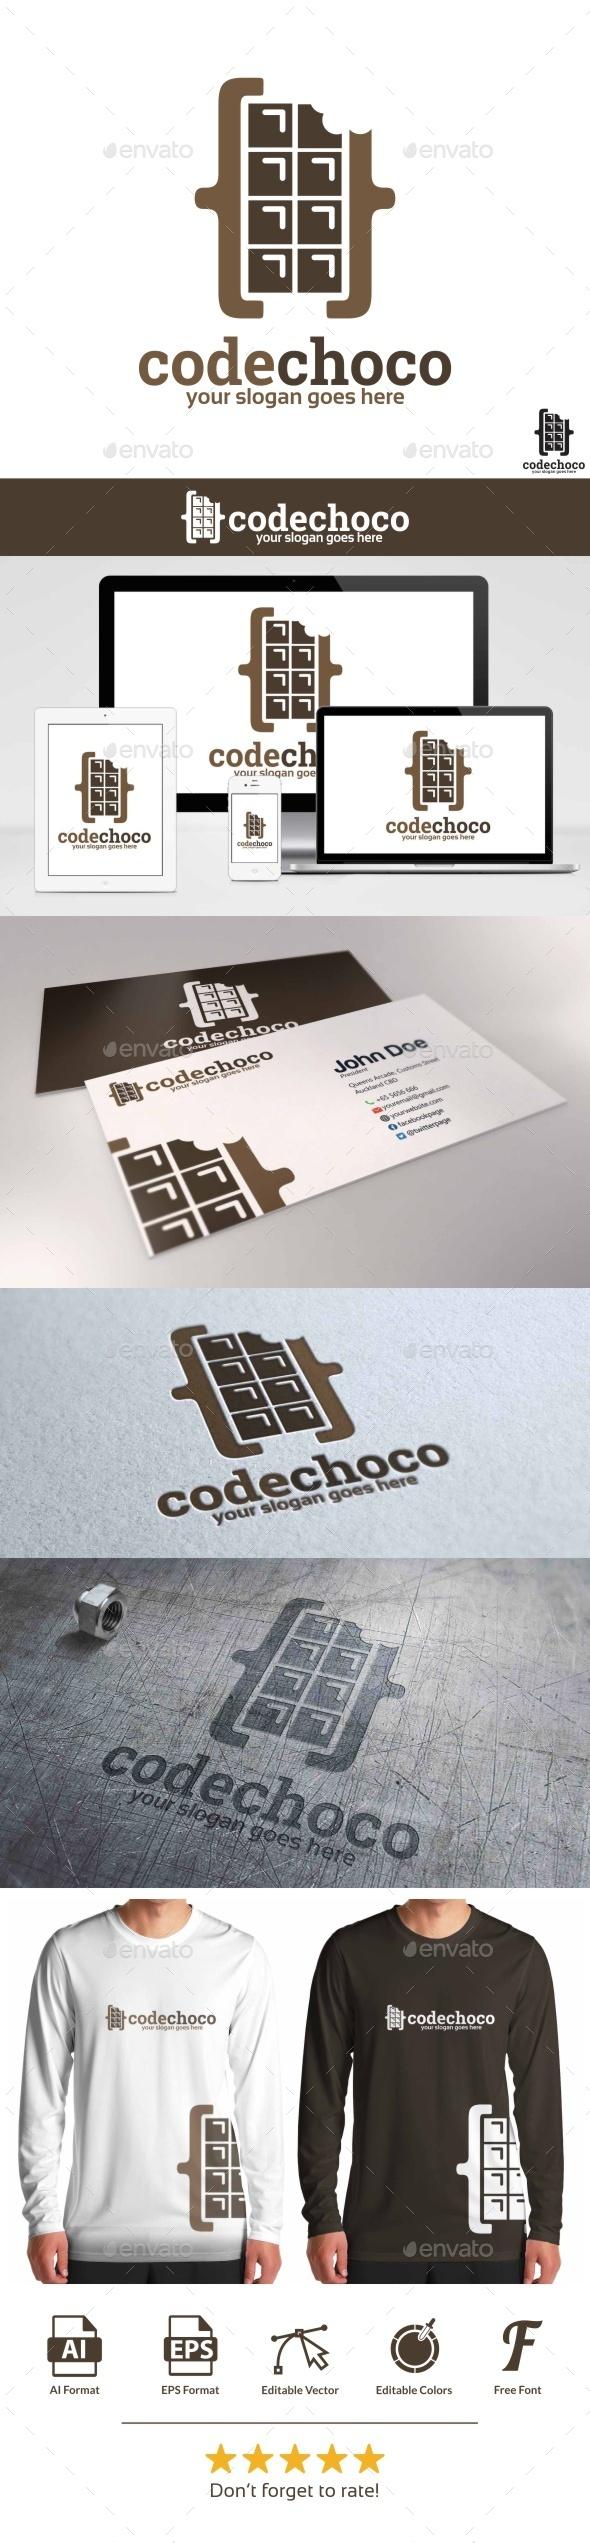 Code Choco Logo - Objects Logo Templates